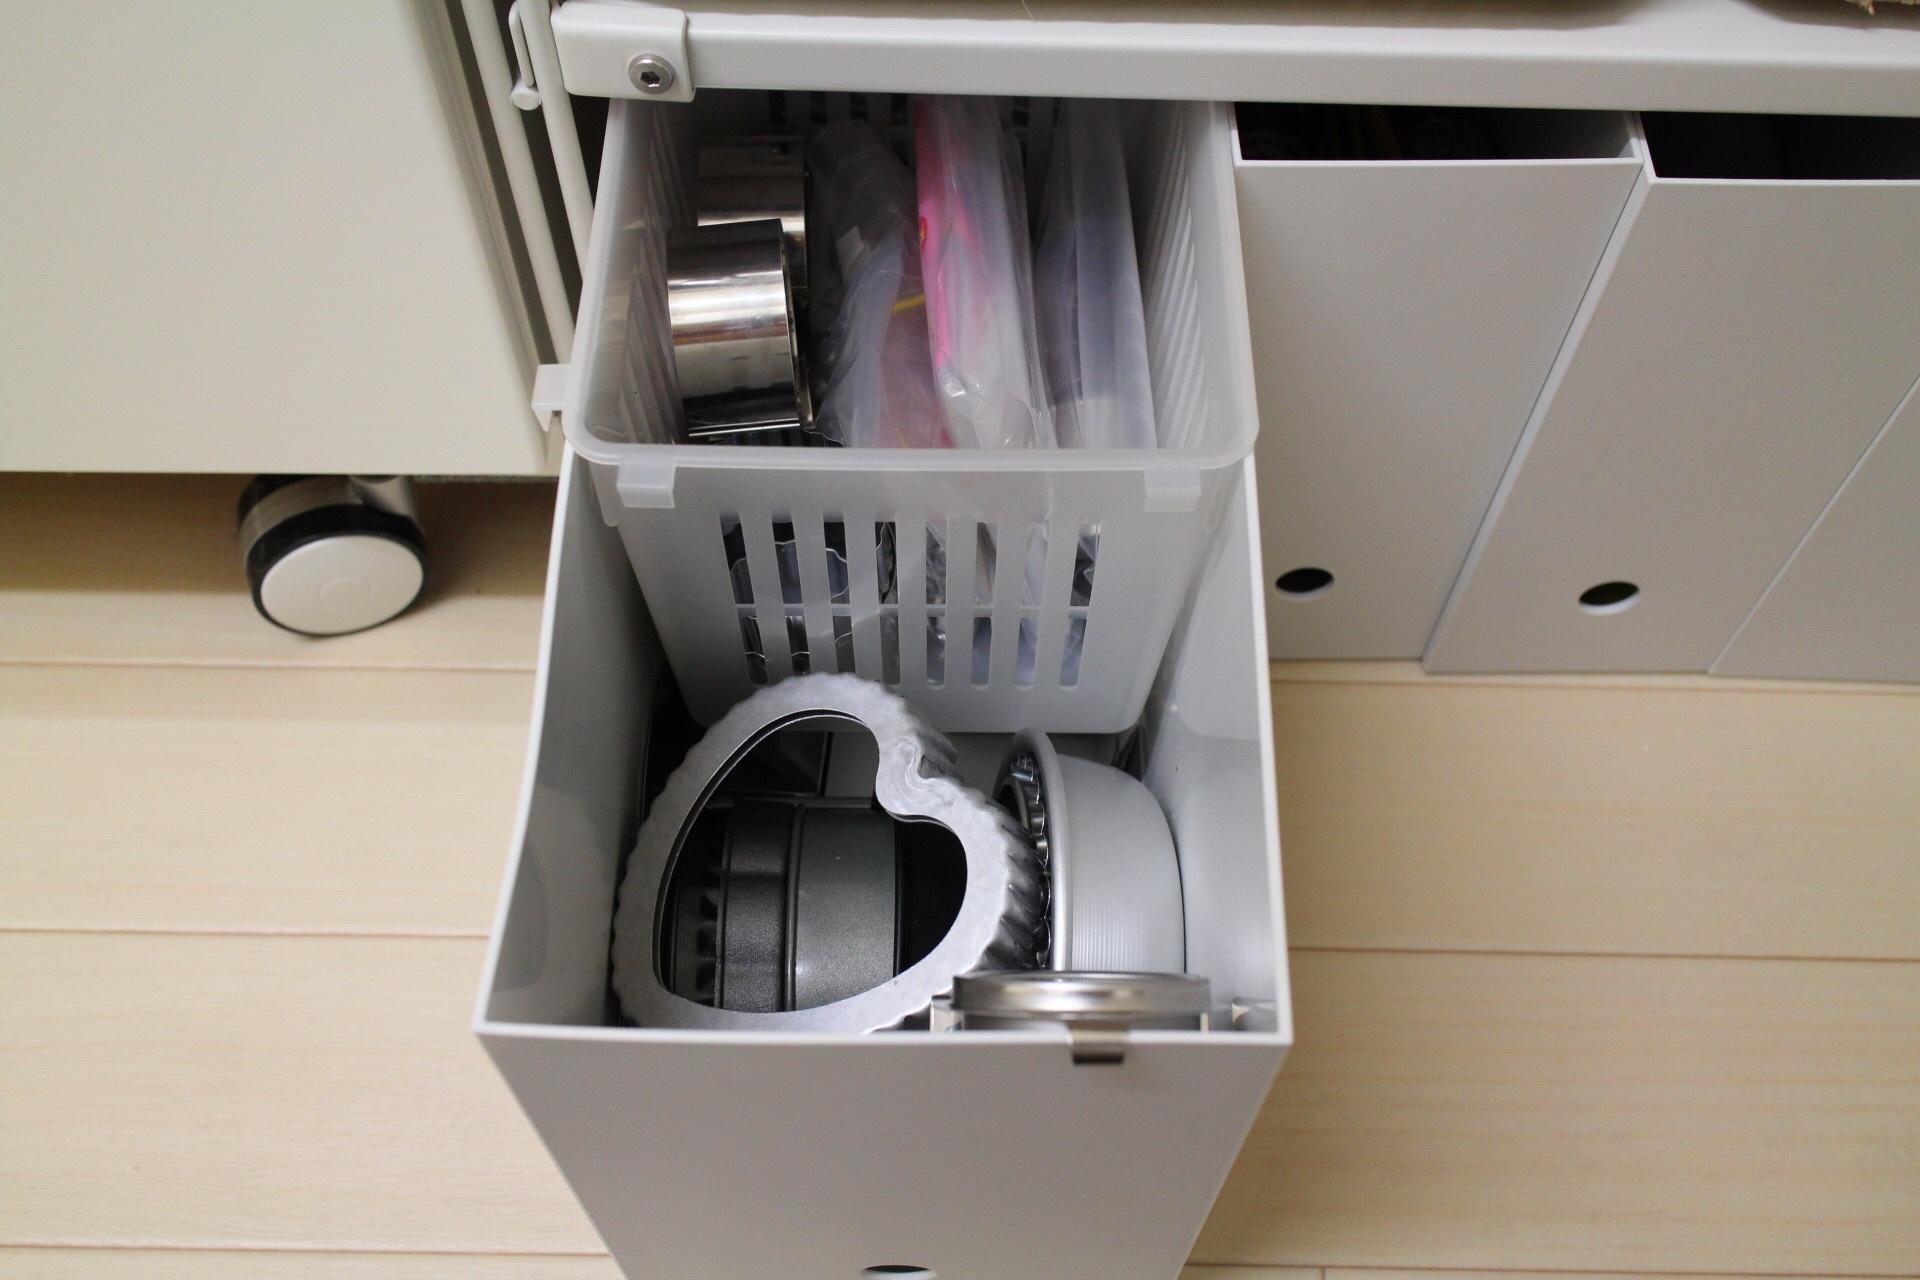 kitchenプチ改造〜after〜(前編)_1_5